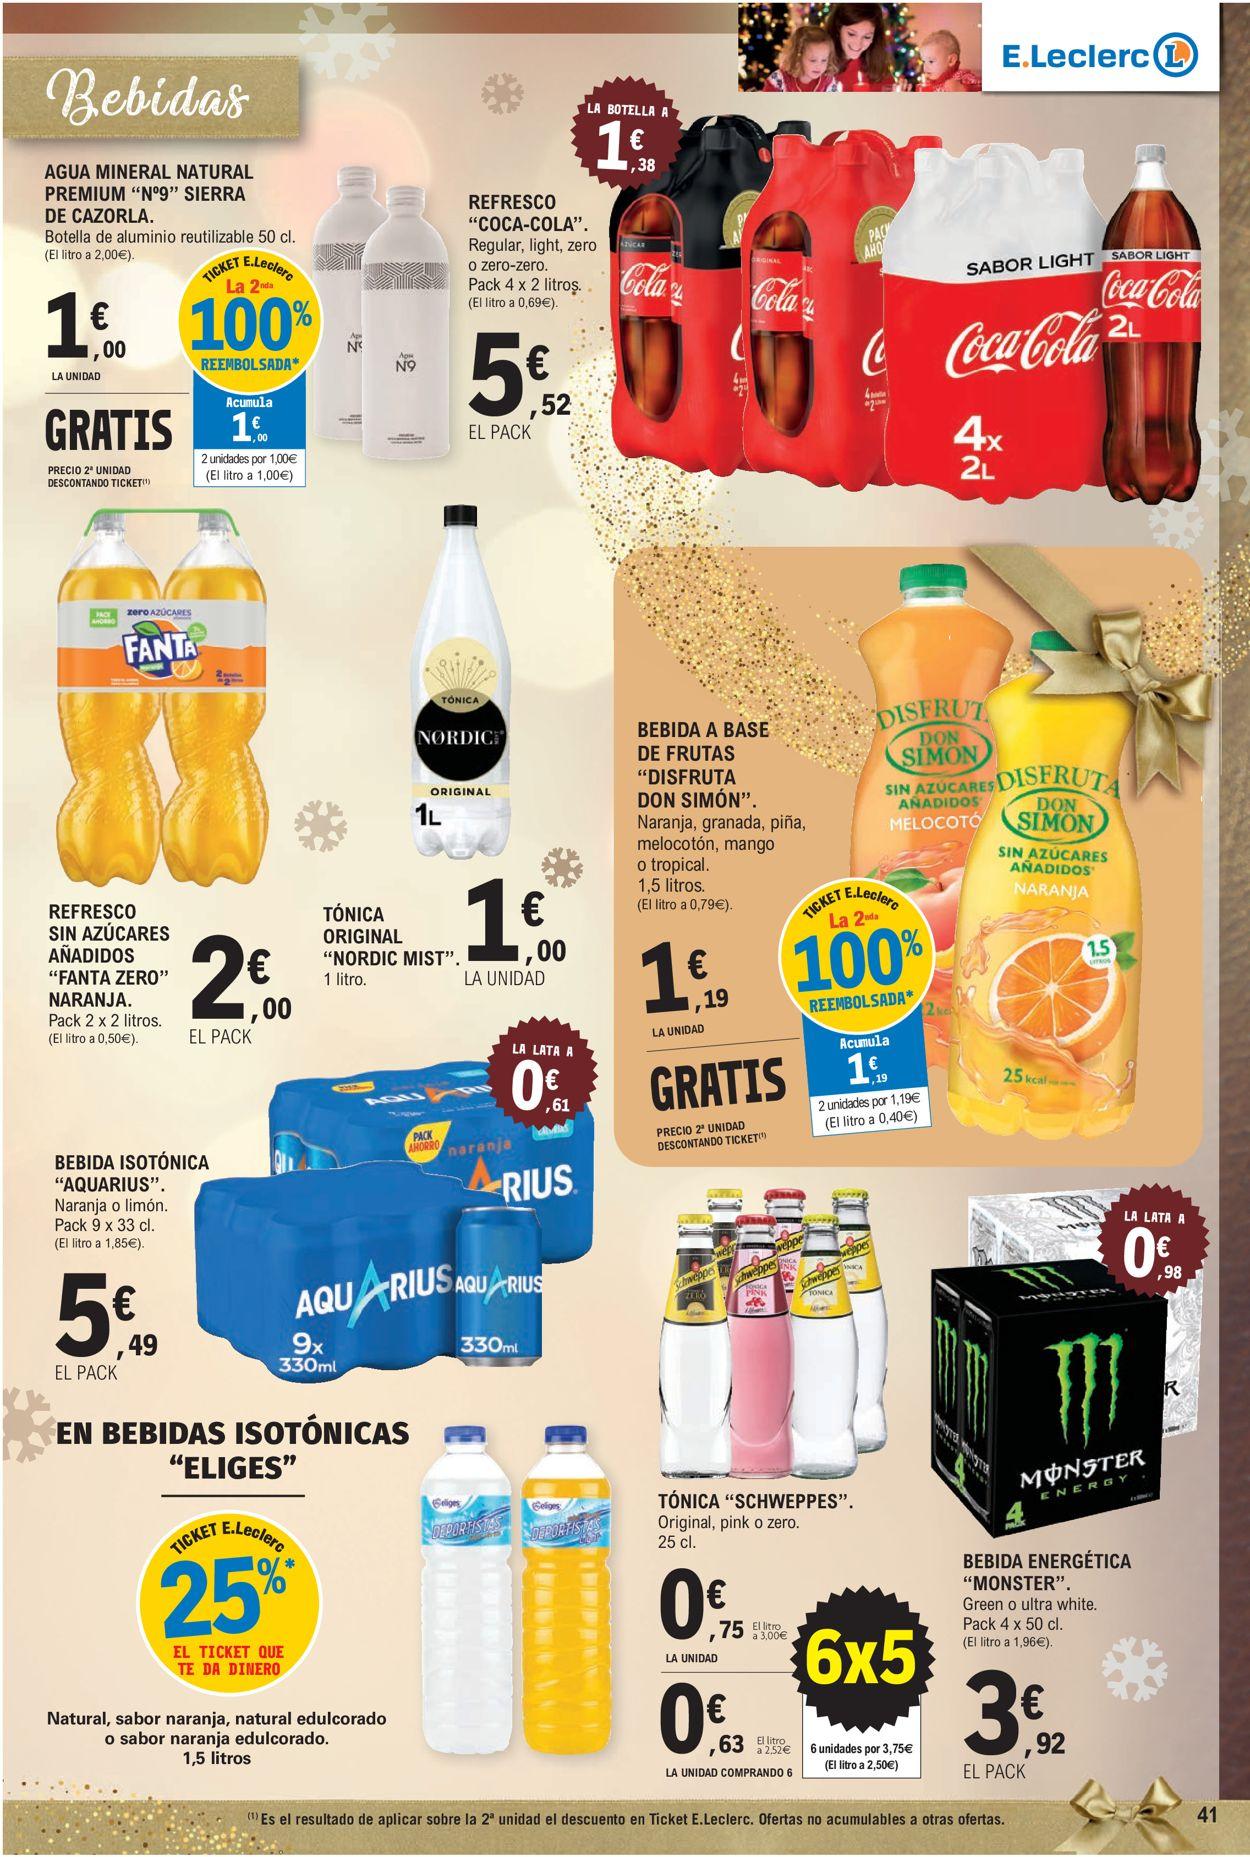 E.leclerc Navidad 2020 Folleto - 09.12-24.12.2020 (Página 41)